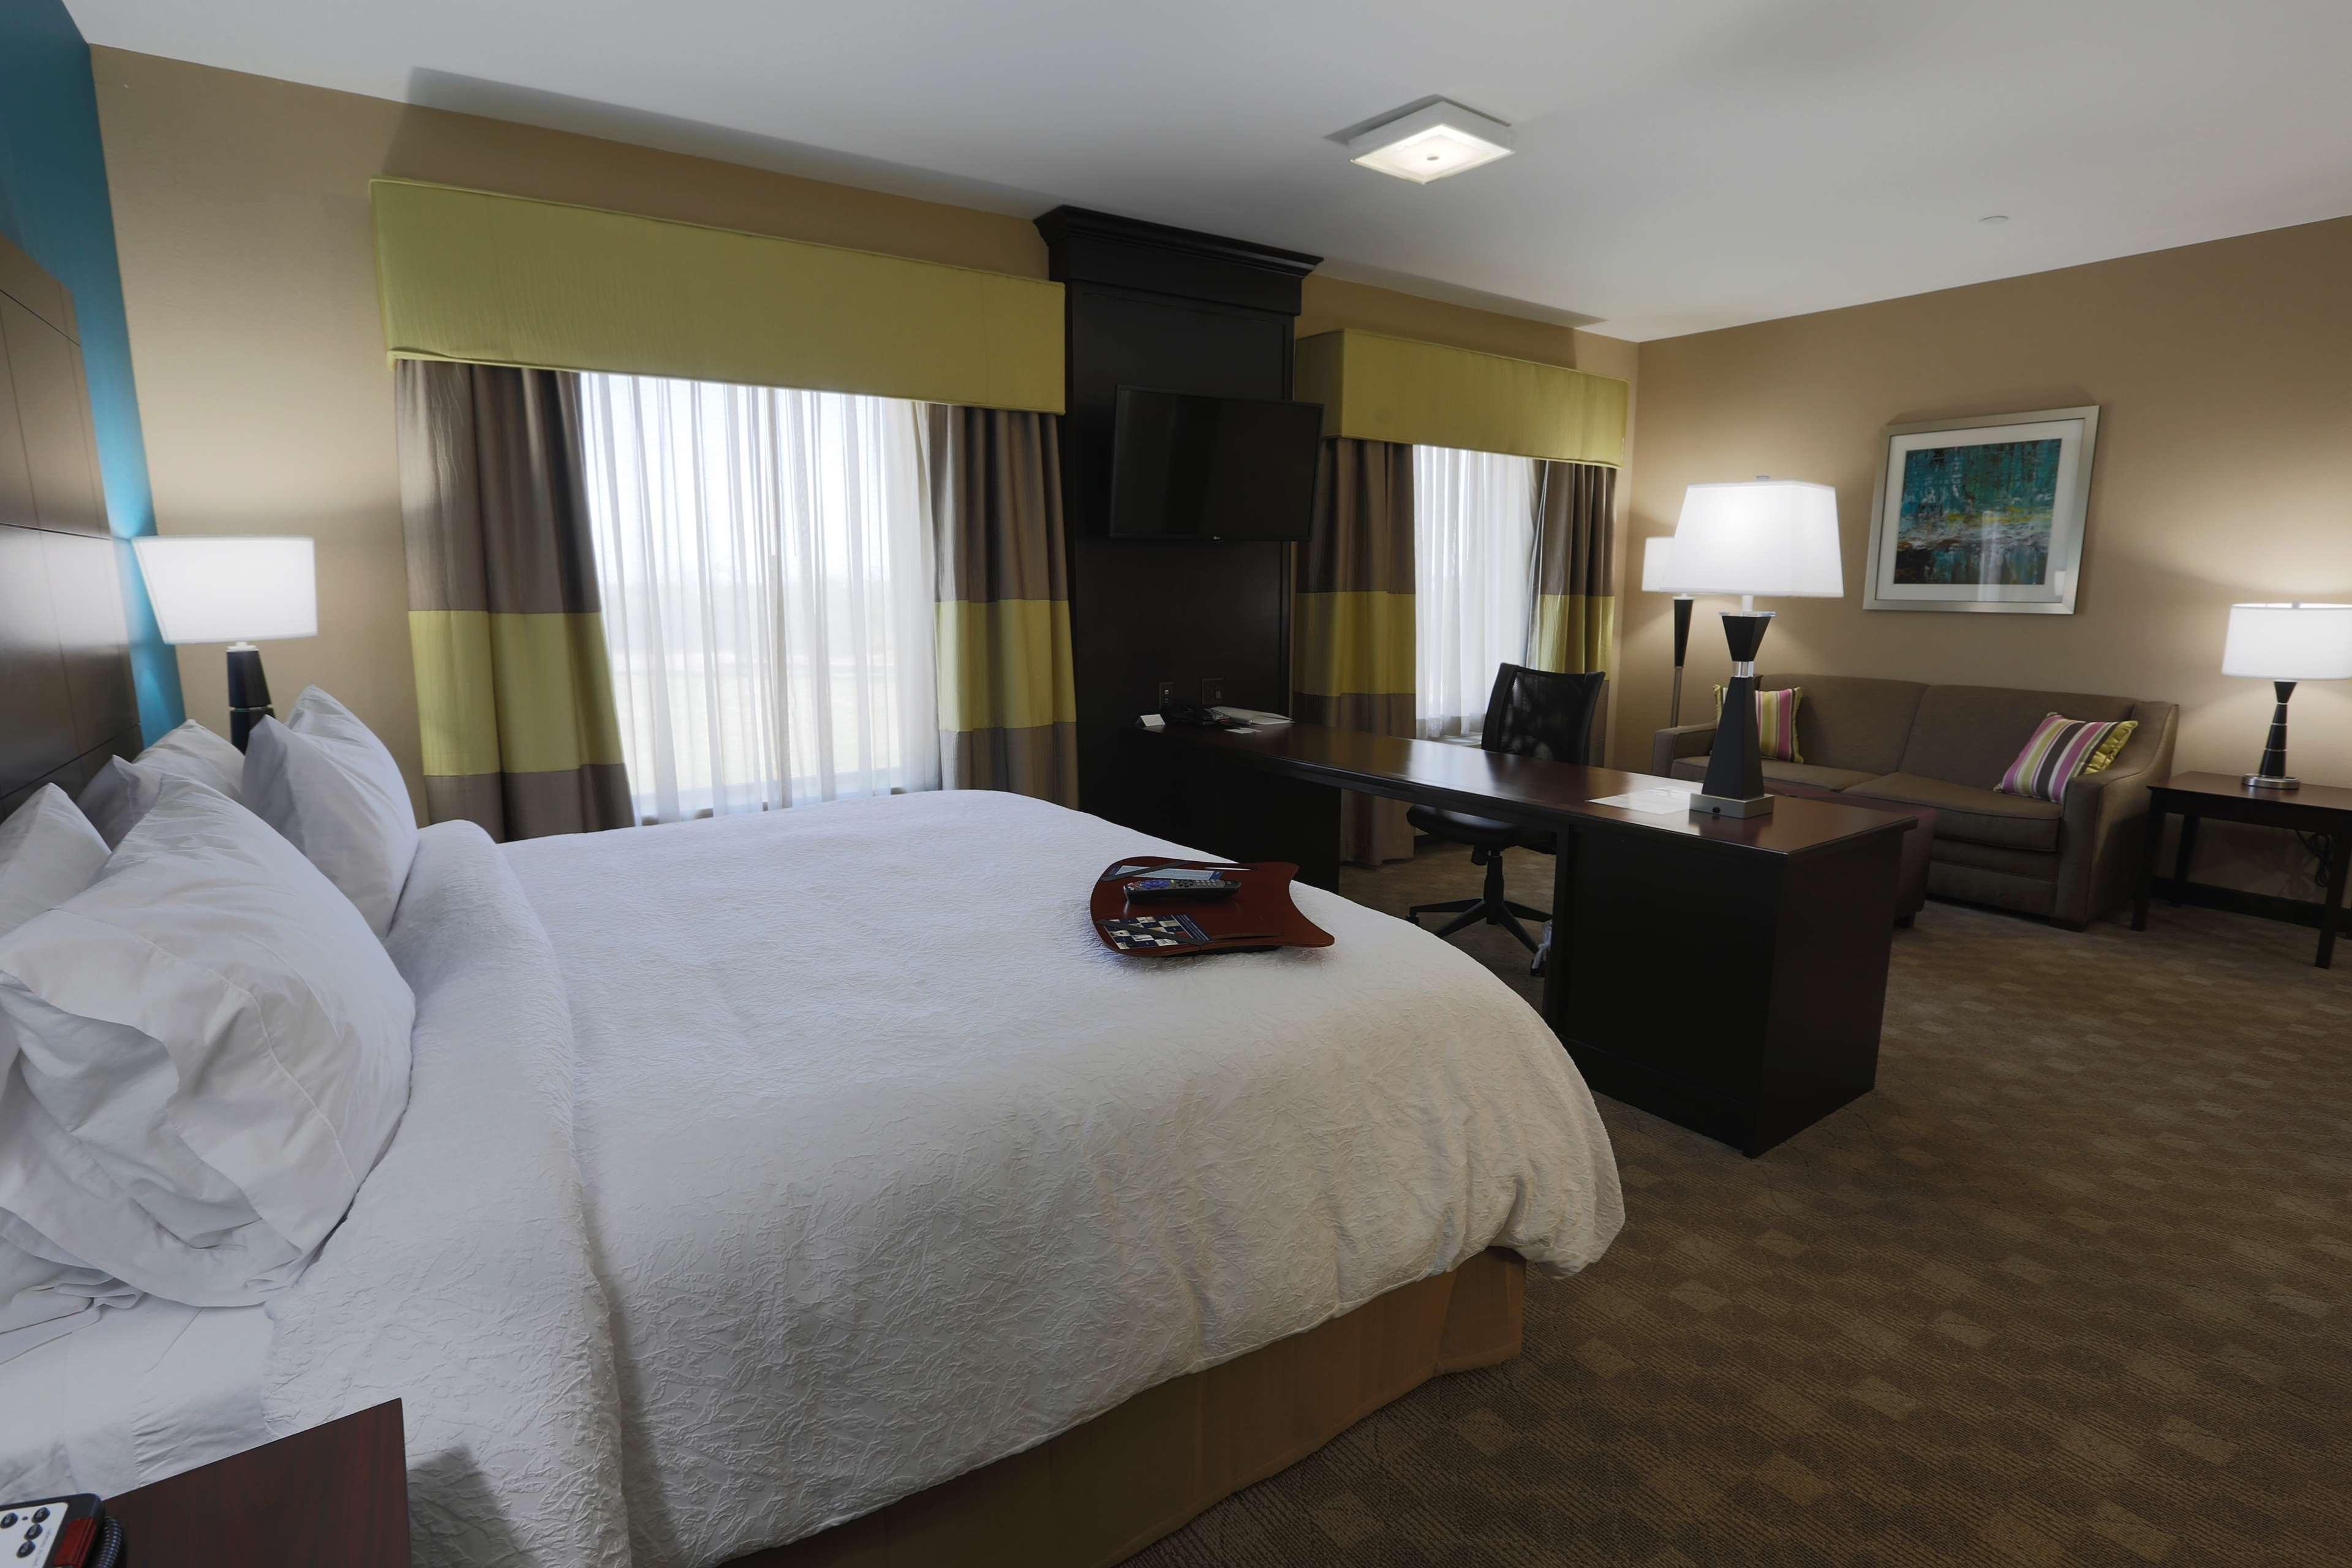 Hampton Inn & Suites Missouri City, TX image 34